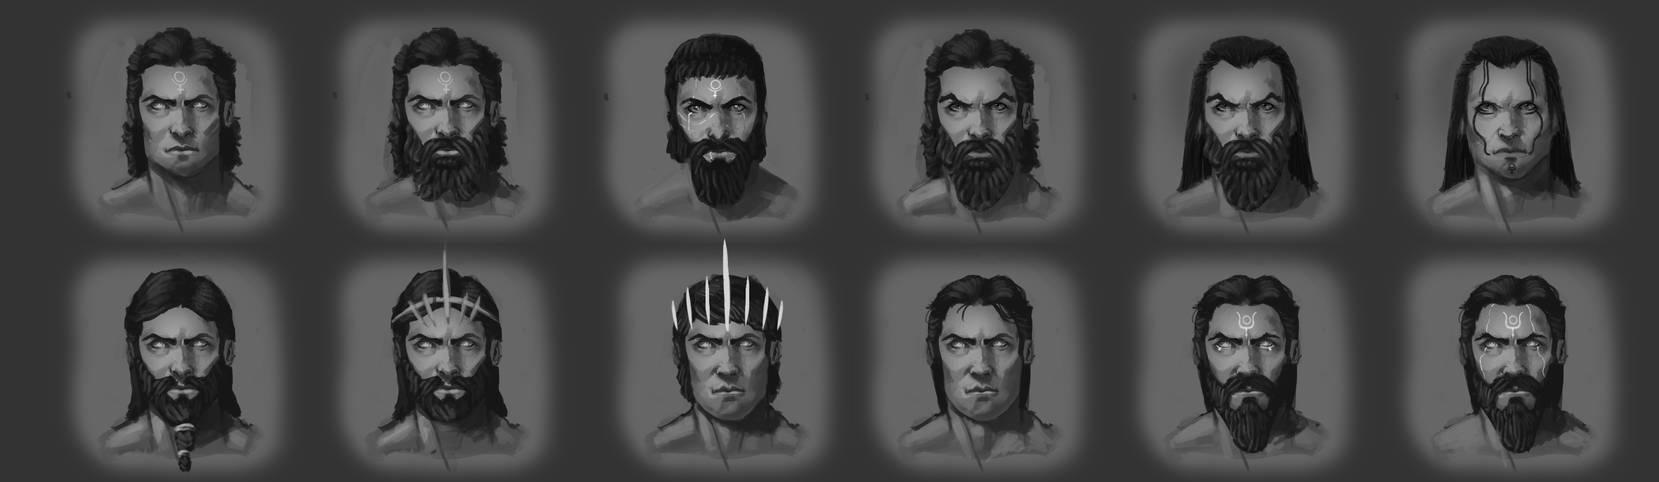 Hades Faces by EmmanuelMadailArt